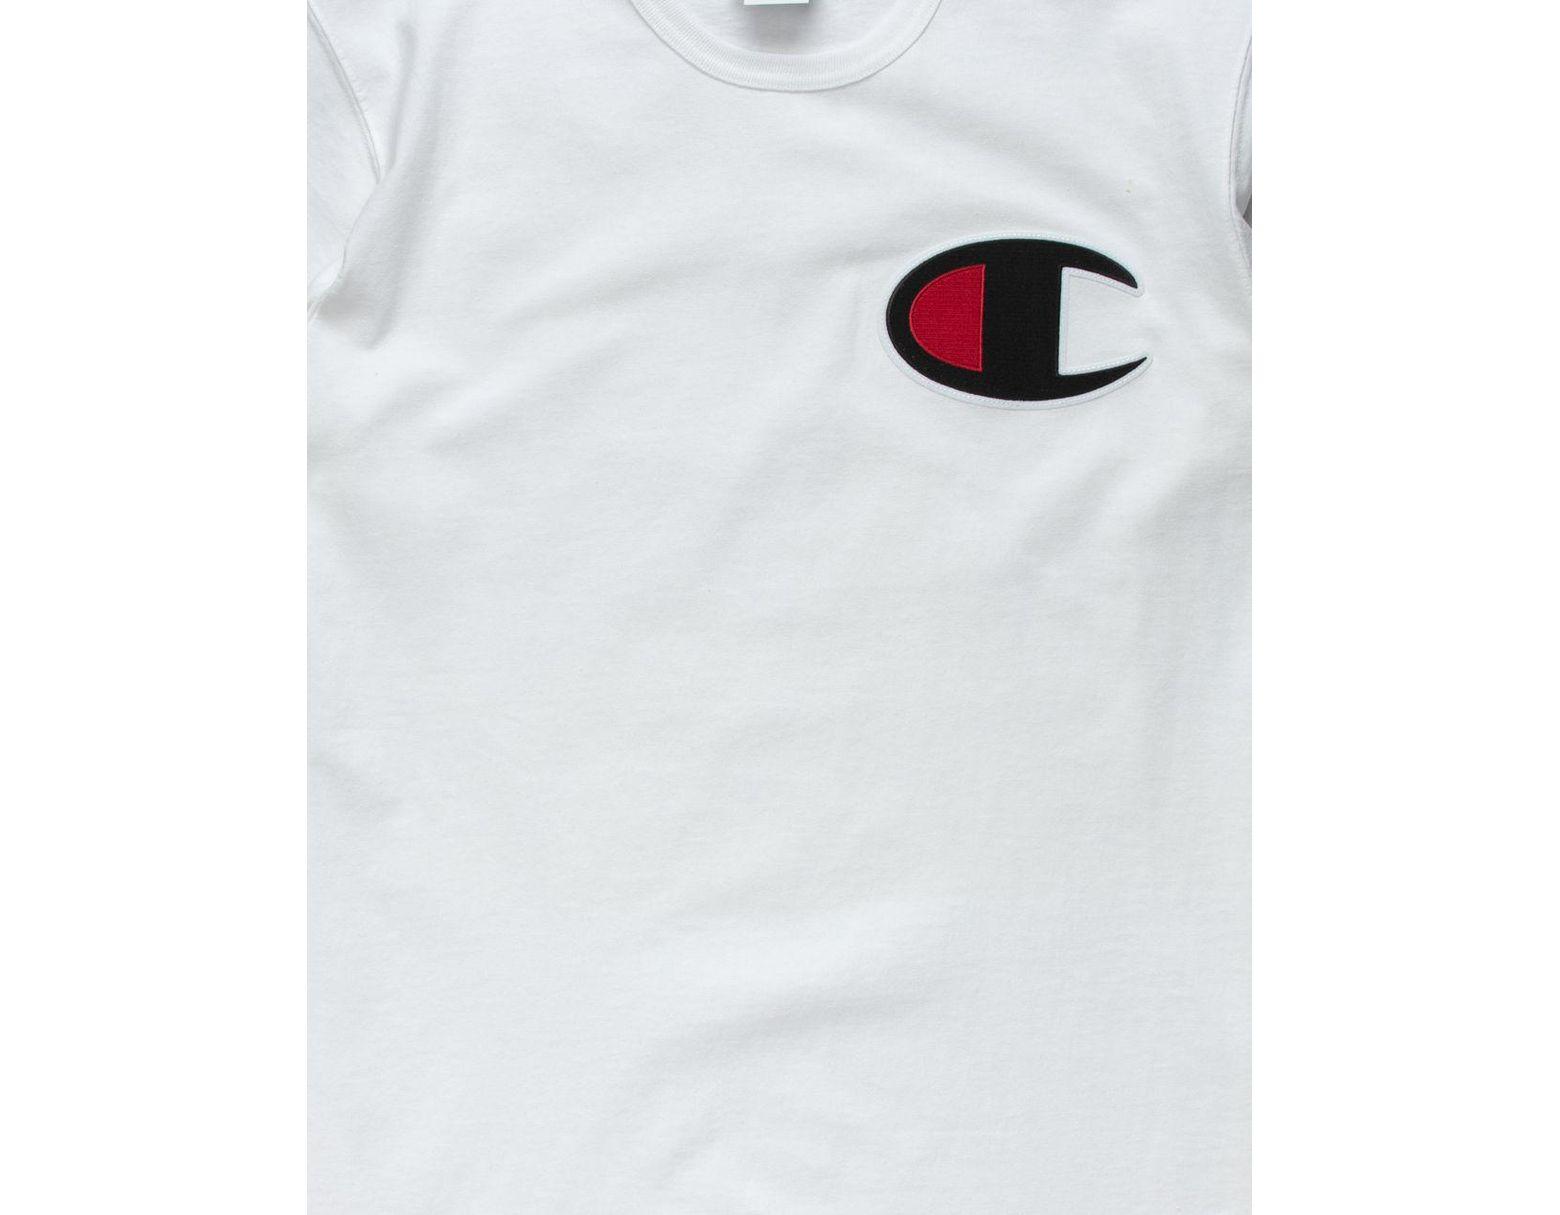 Lyst champion c applique logo white mens t shirt in white